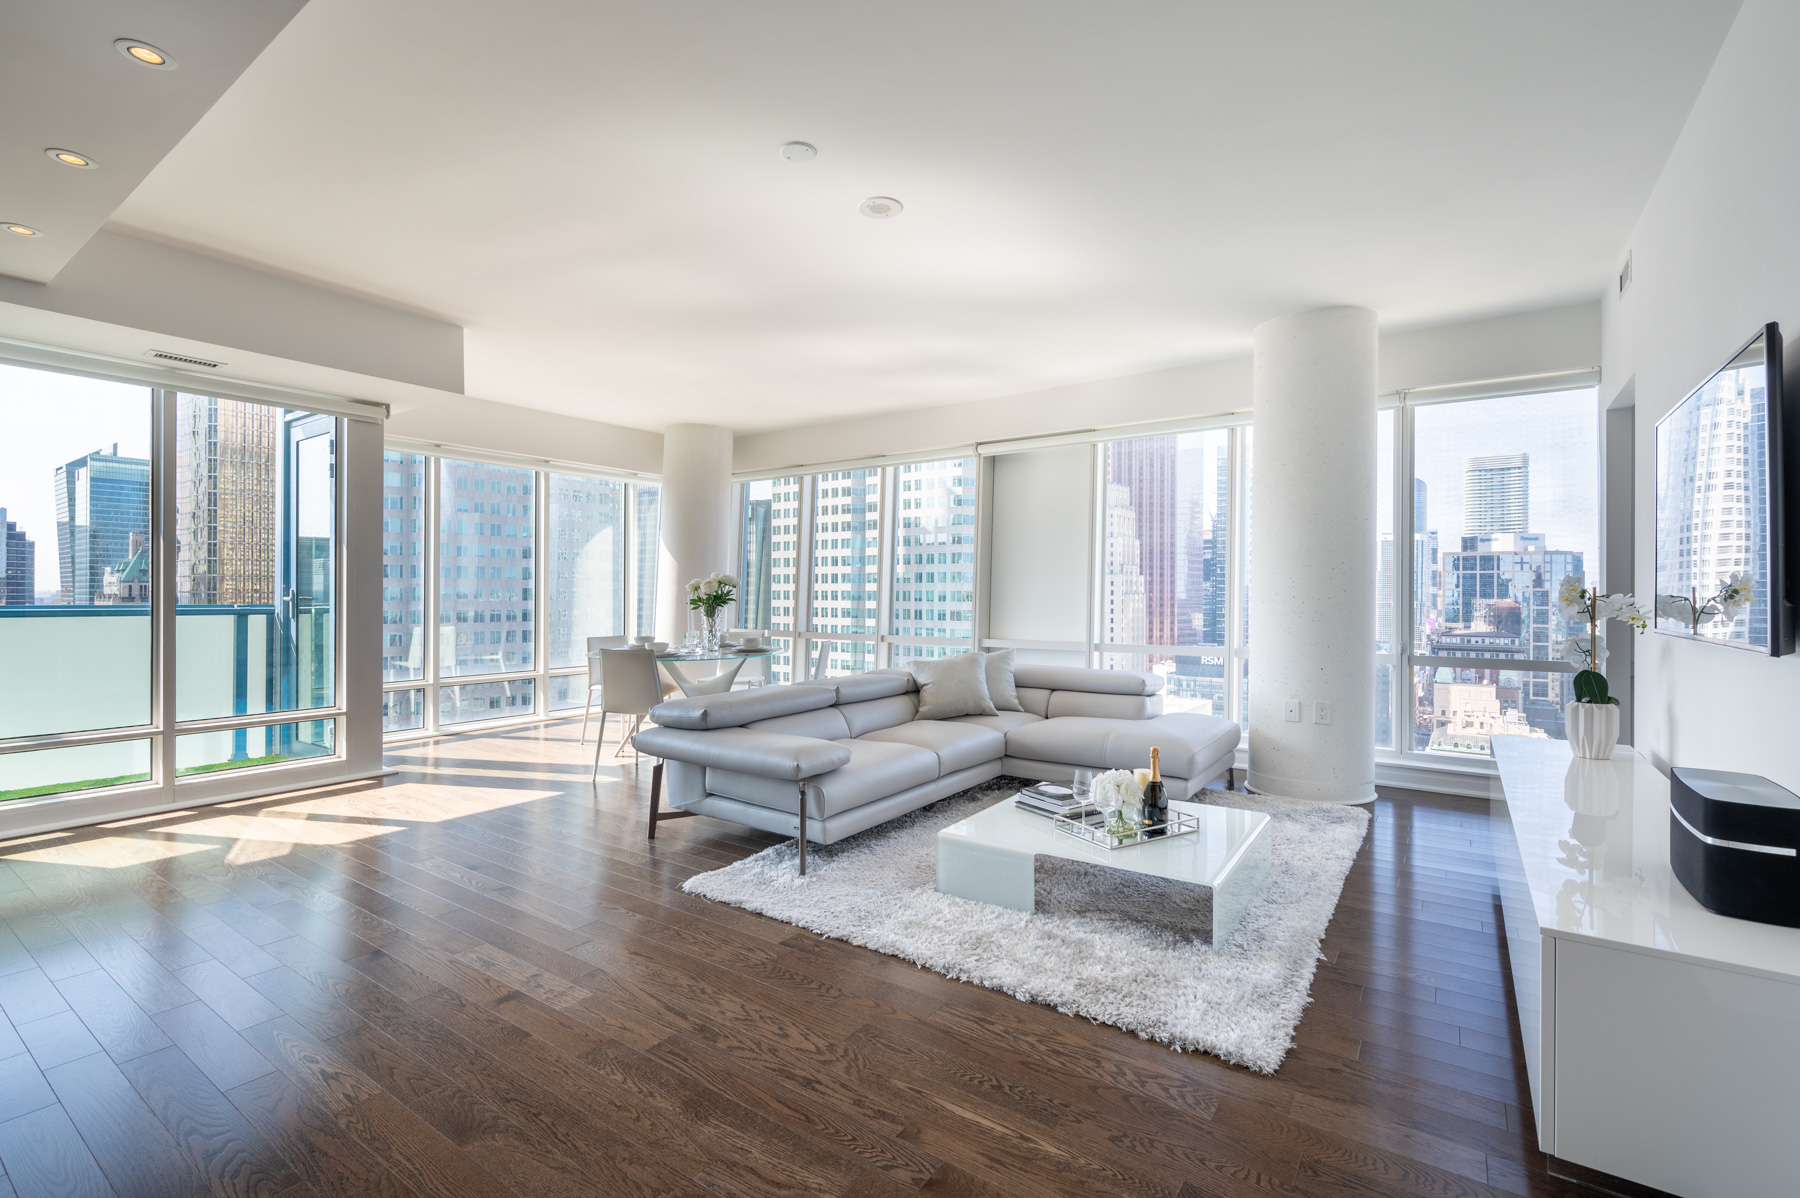 Condo with huge windows and hardwood floors.